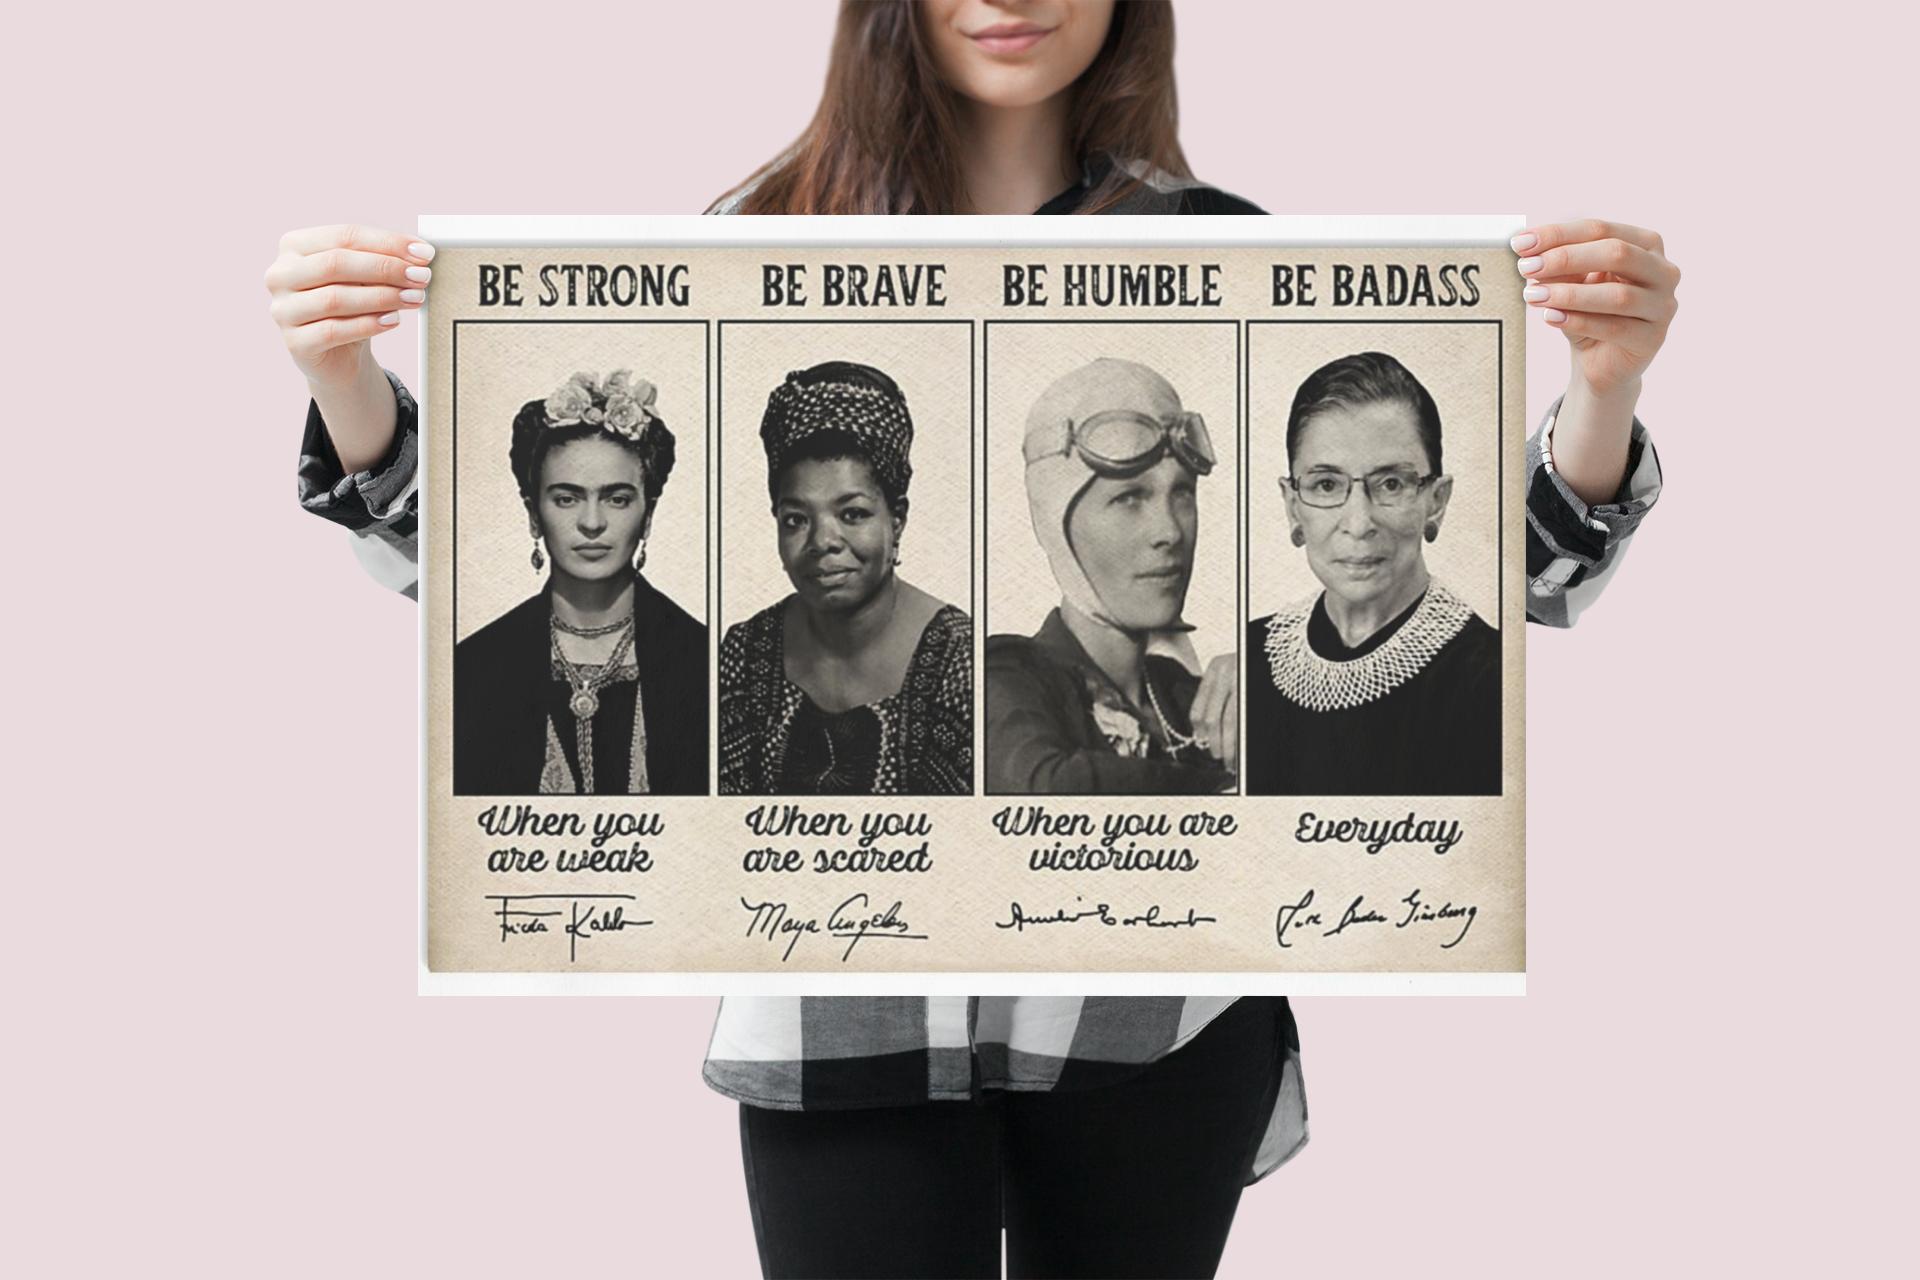 Frida Kahlo Maya Angelou Amelia Earhart Ruth Ginsburg be strong be brave be humble be badass poster 21